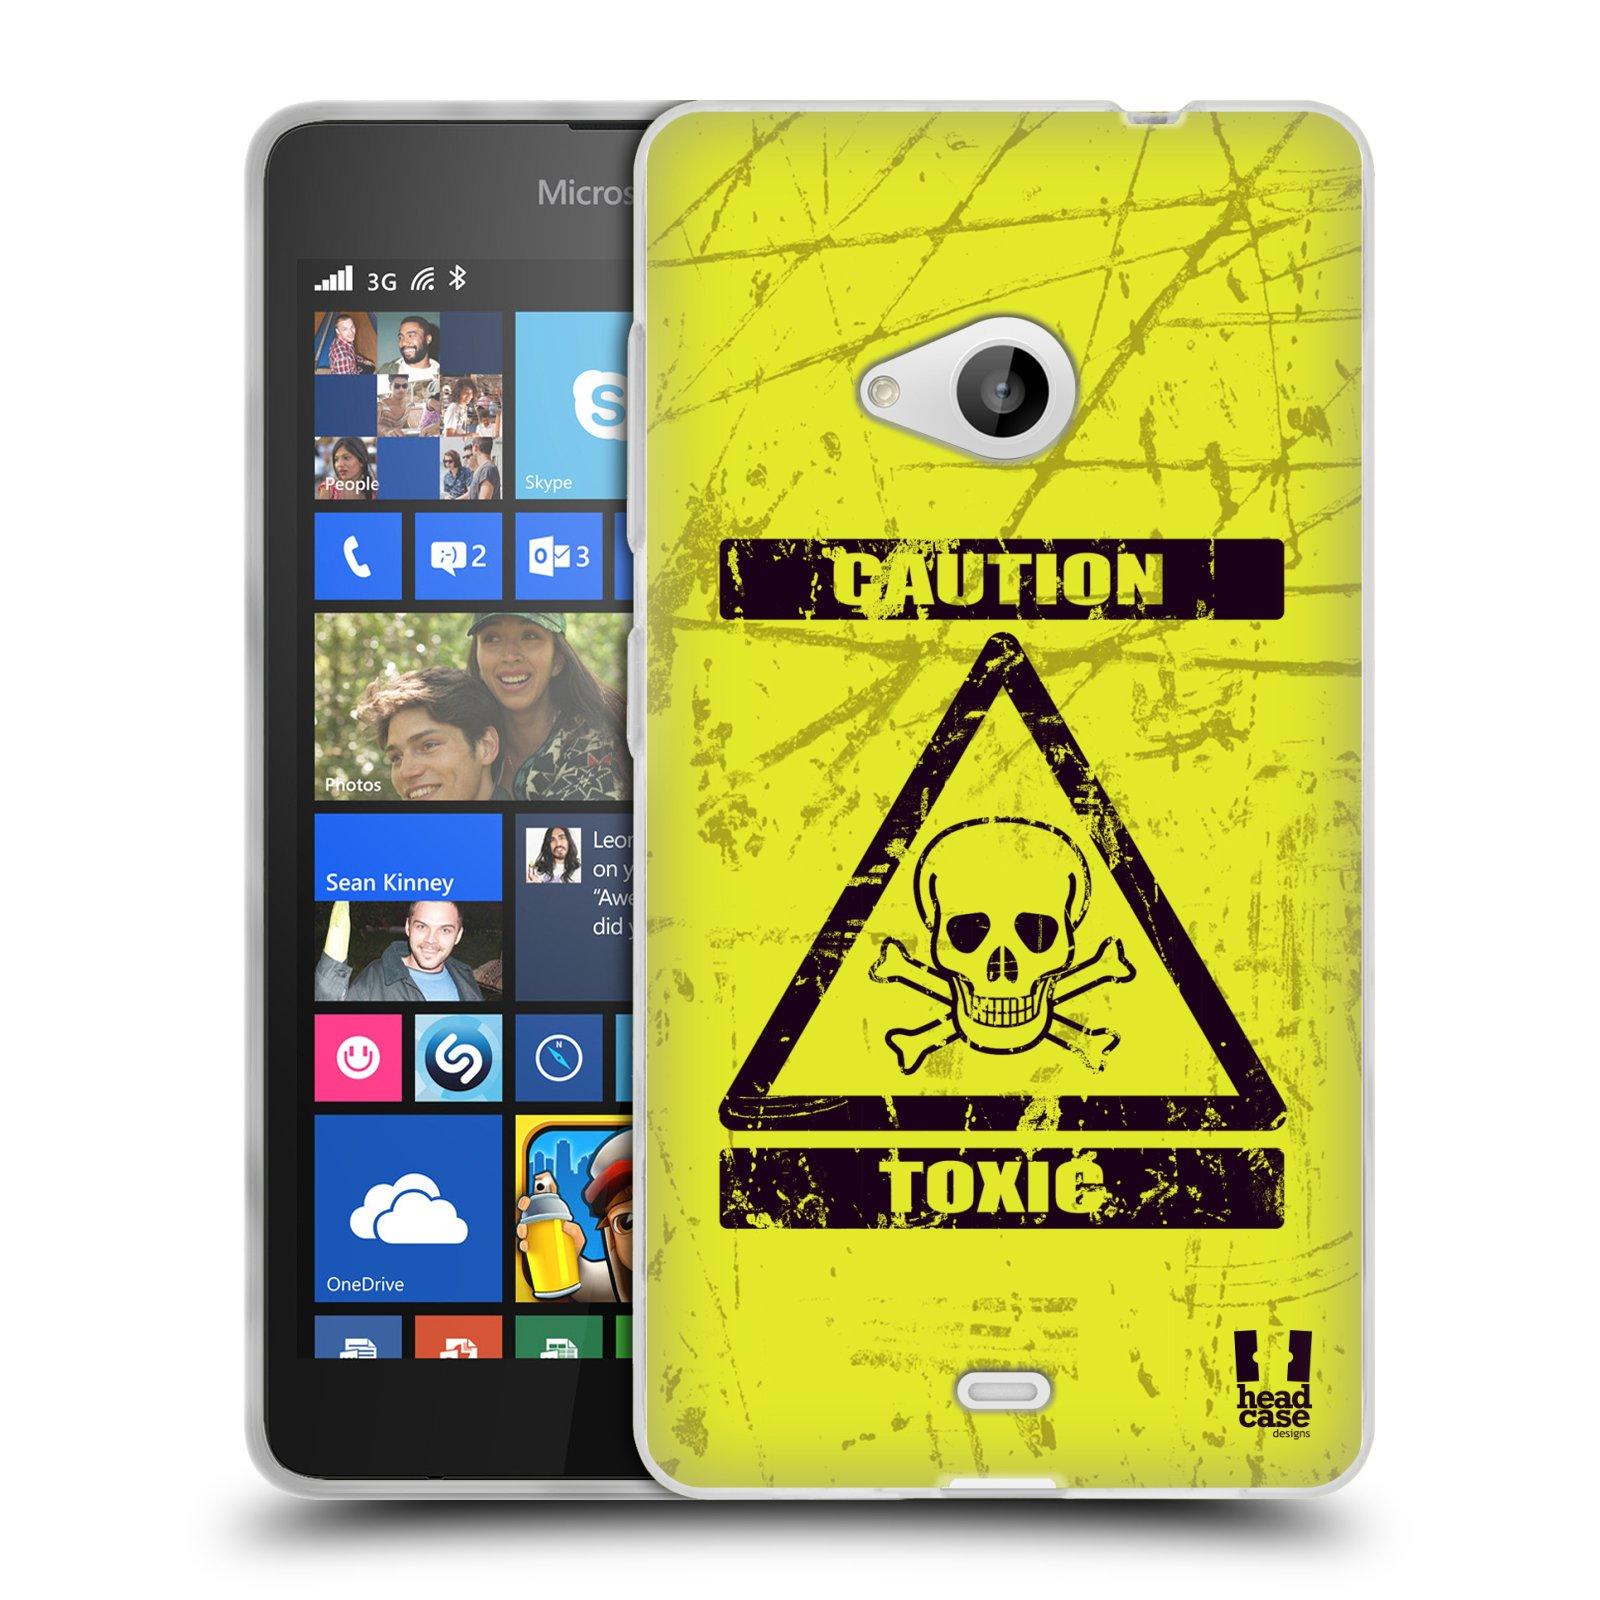 Silikonové pouzdro na mobil Microsoft Lumia 535 HEAD CASE TOXIC (Silikonový kryt či obal na mobilní telefon Microsoft Lumia 535)